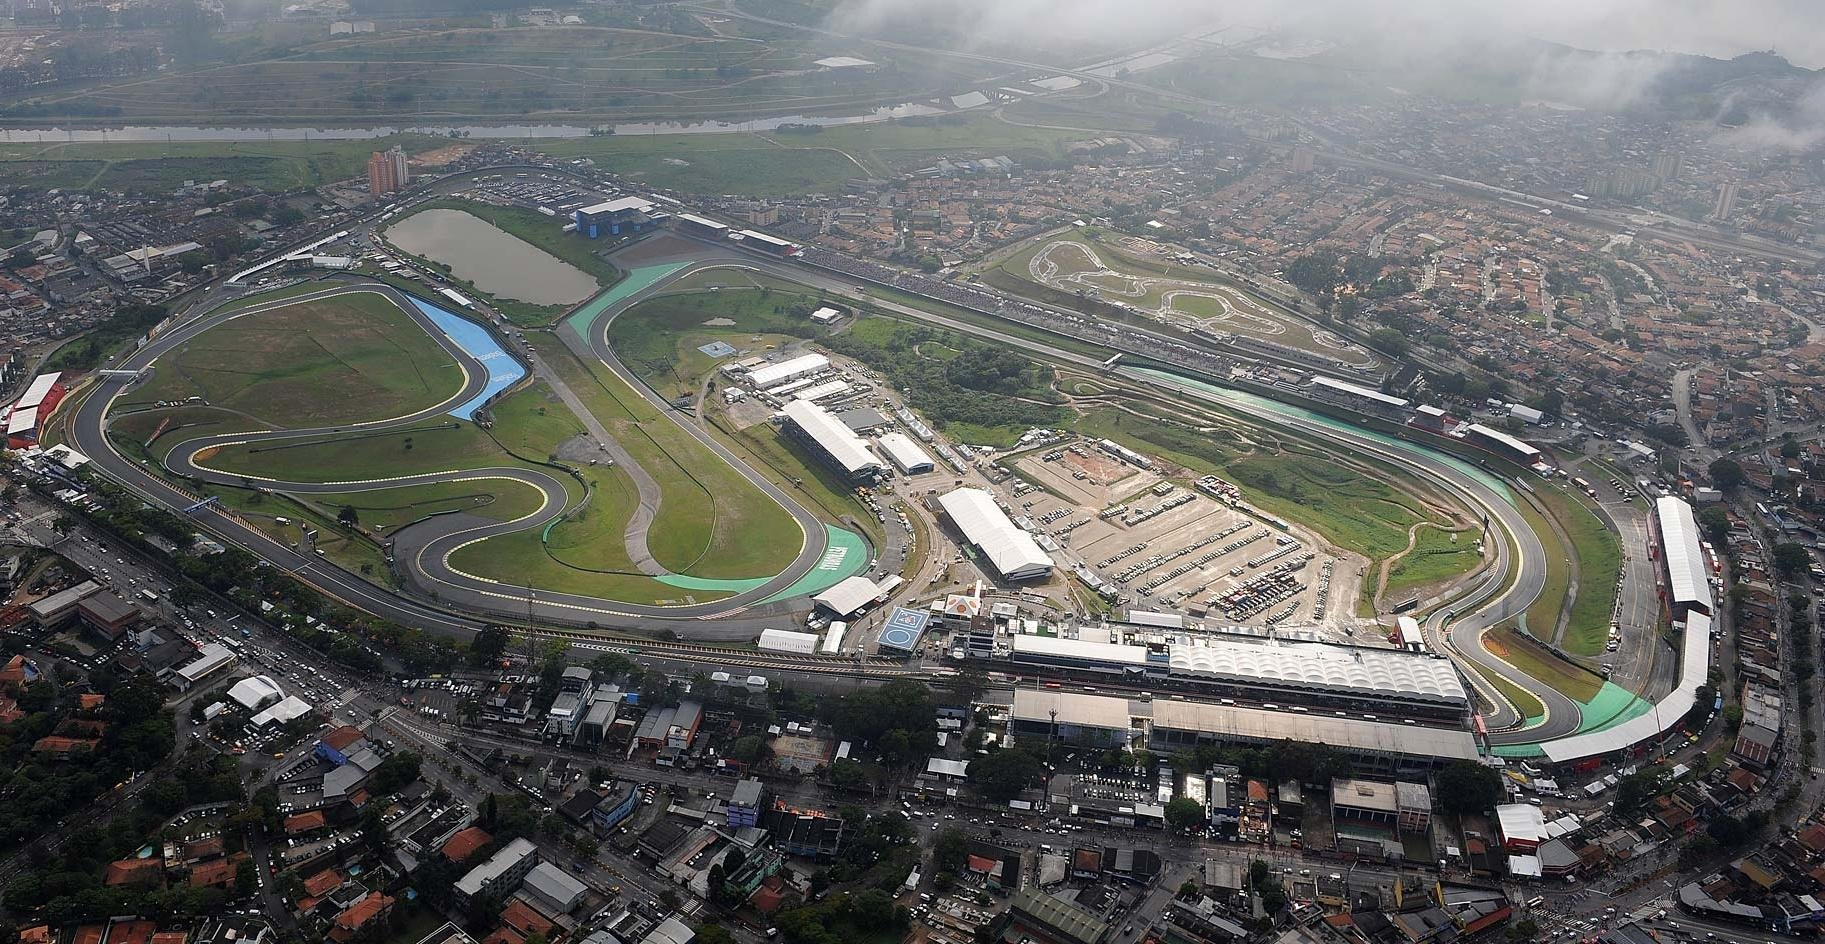 CircuitJosé Carlos Pace (Interlagos), Sao Paulo, Brésil